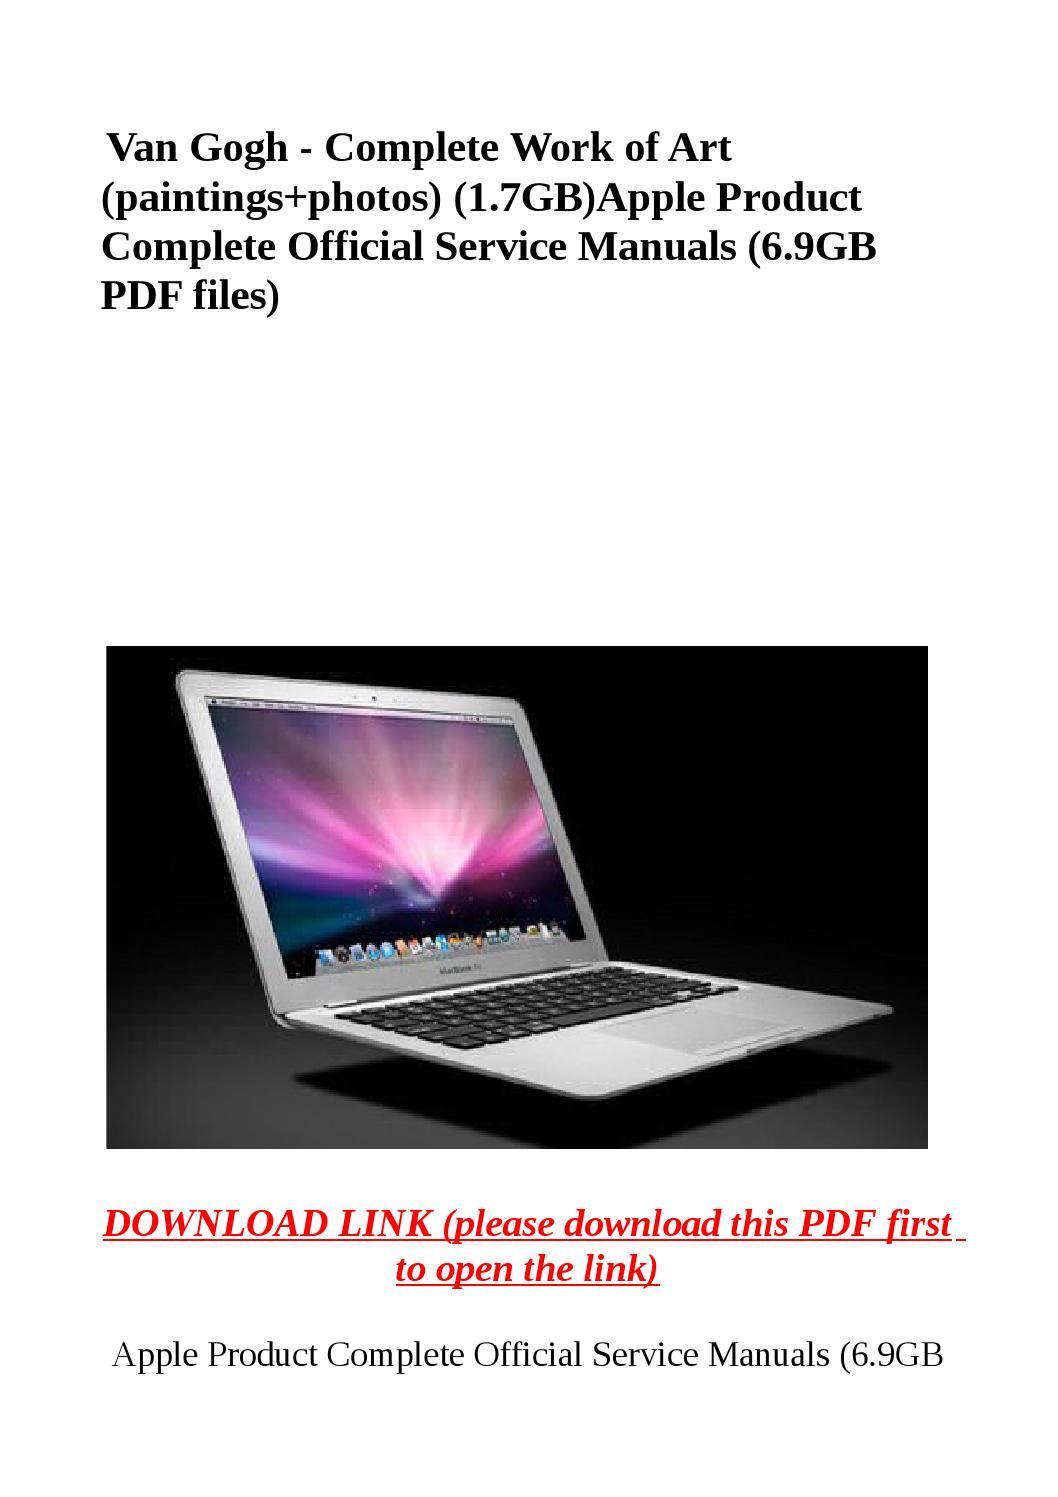 Apple Technician Service .PDF Manual for Apple Xserve G5 Cluster Node /& Jan.2005